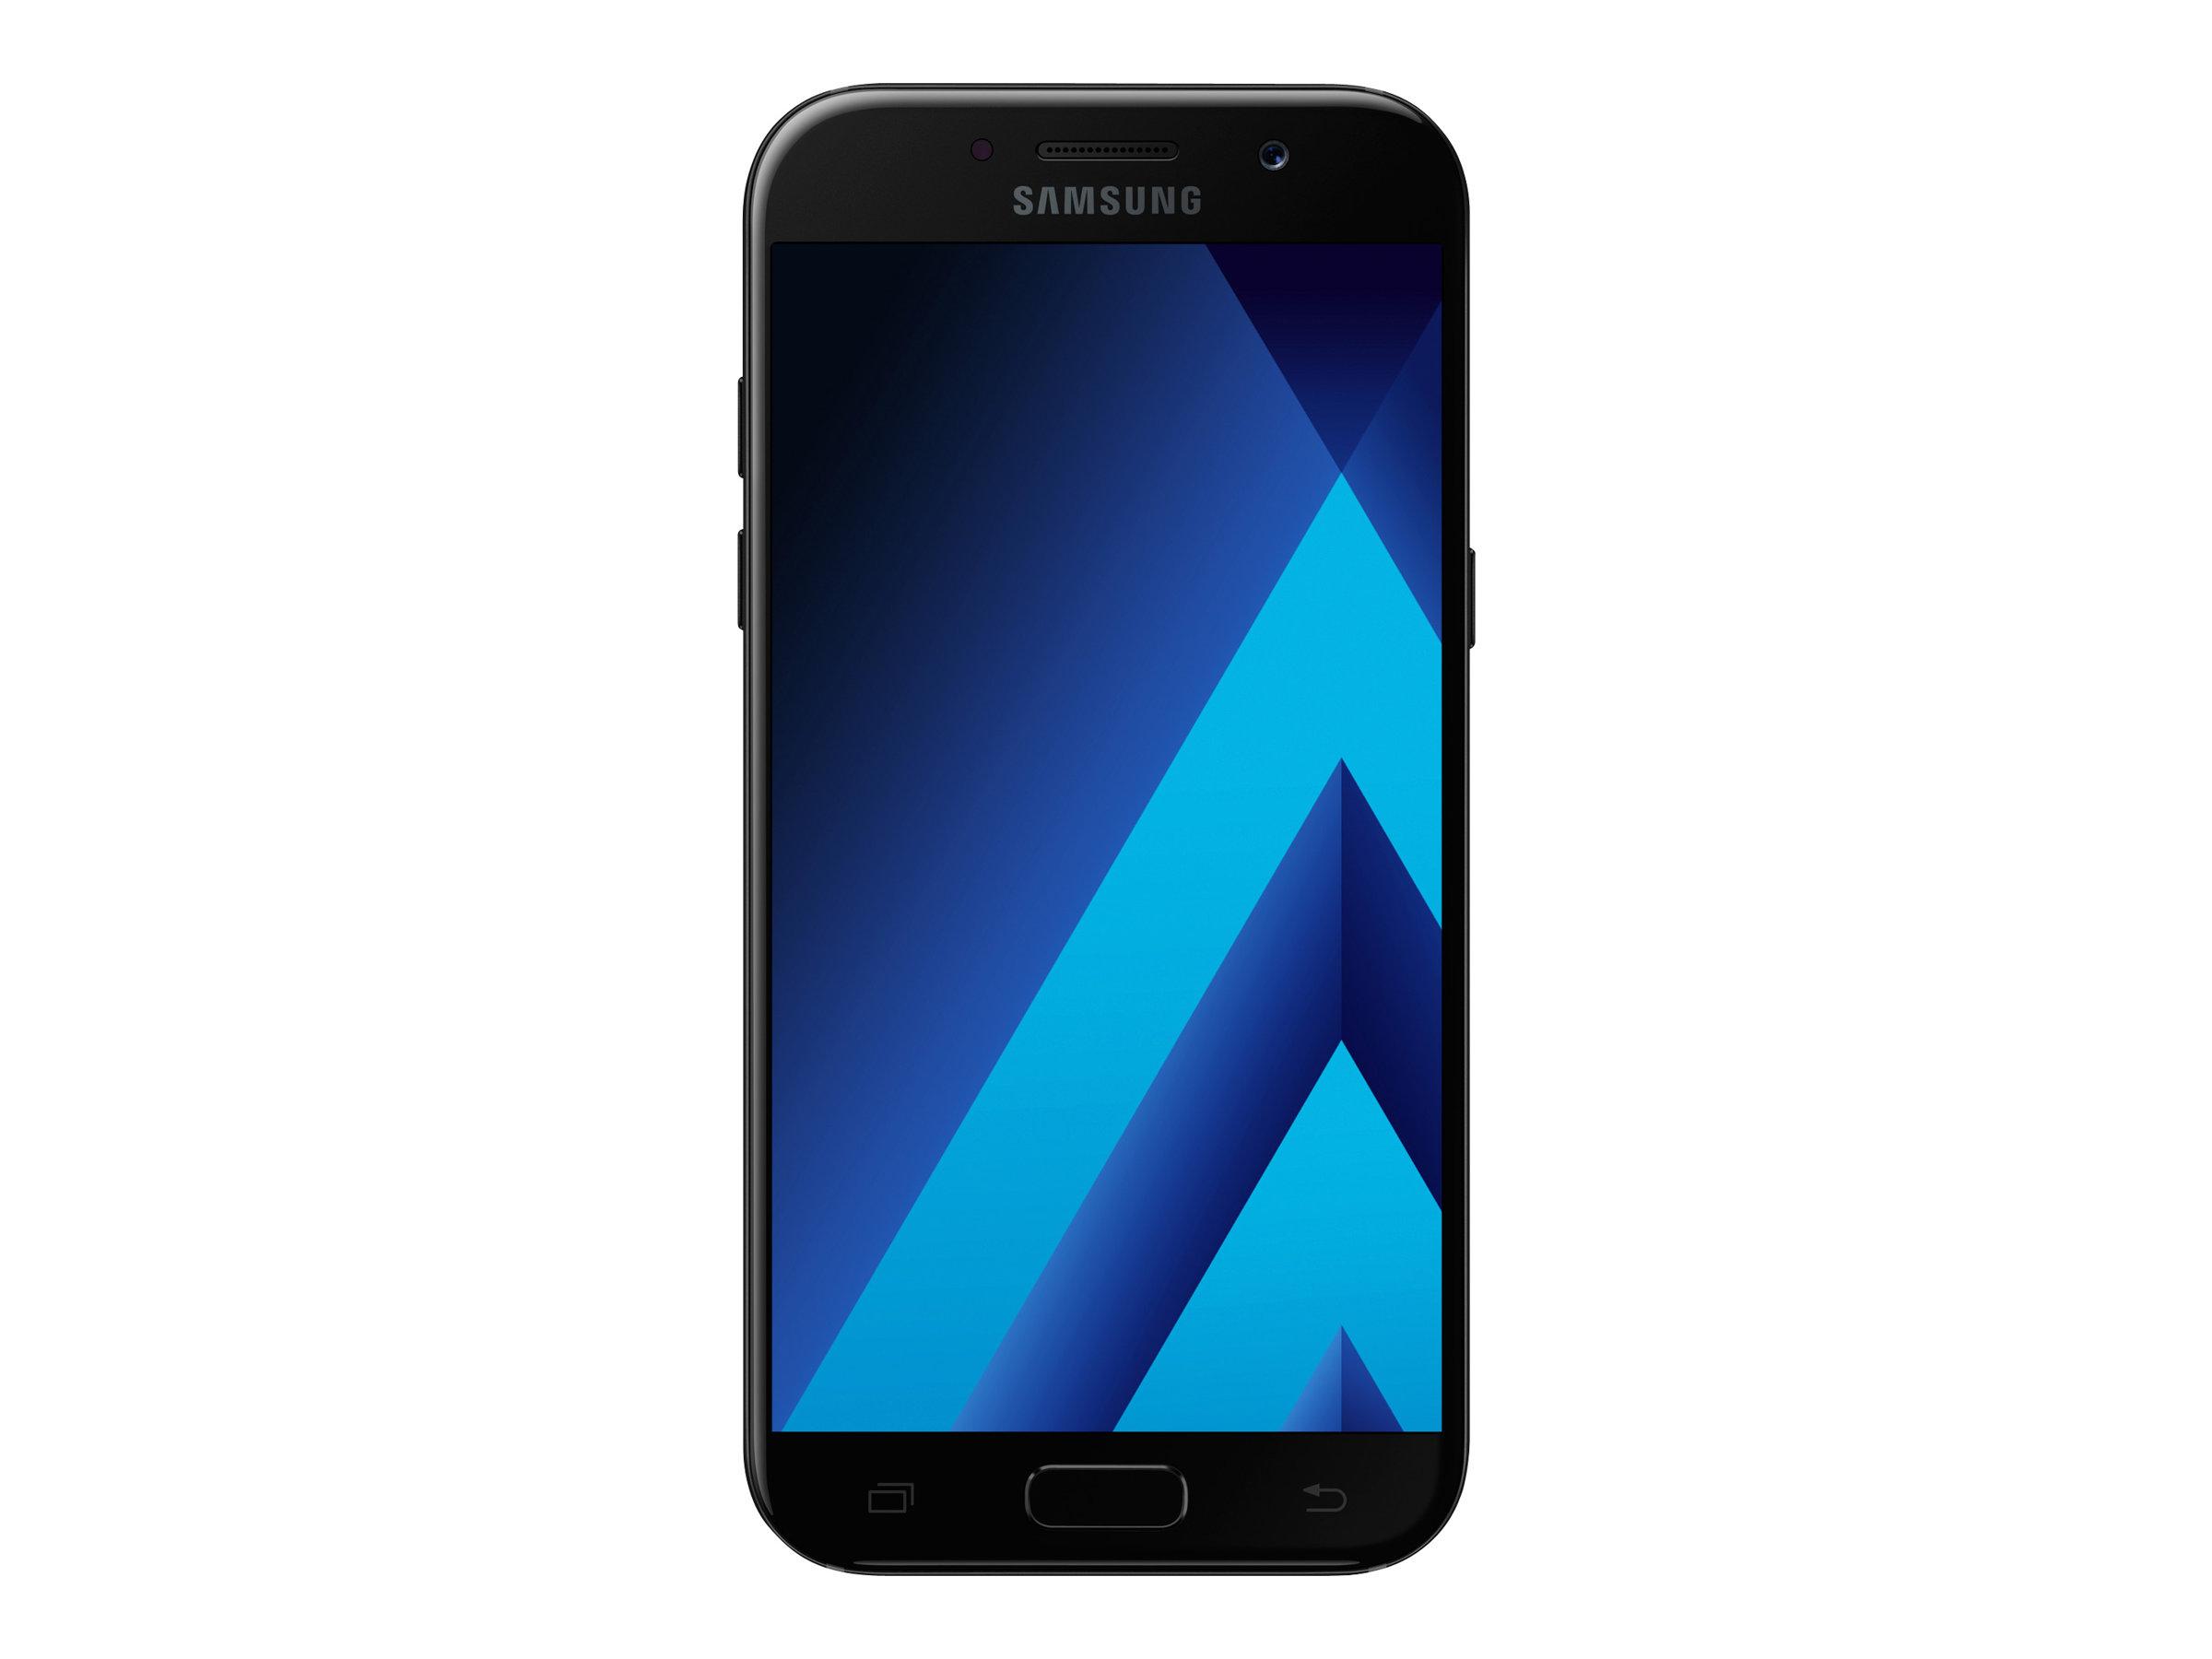 Samsung Galaxy A5 (2017) - SM-A520F - Smartphone - 4G LTE - 32 GB - microSDXC slot